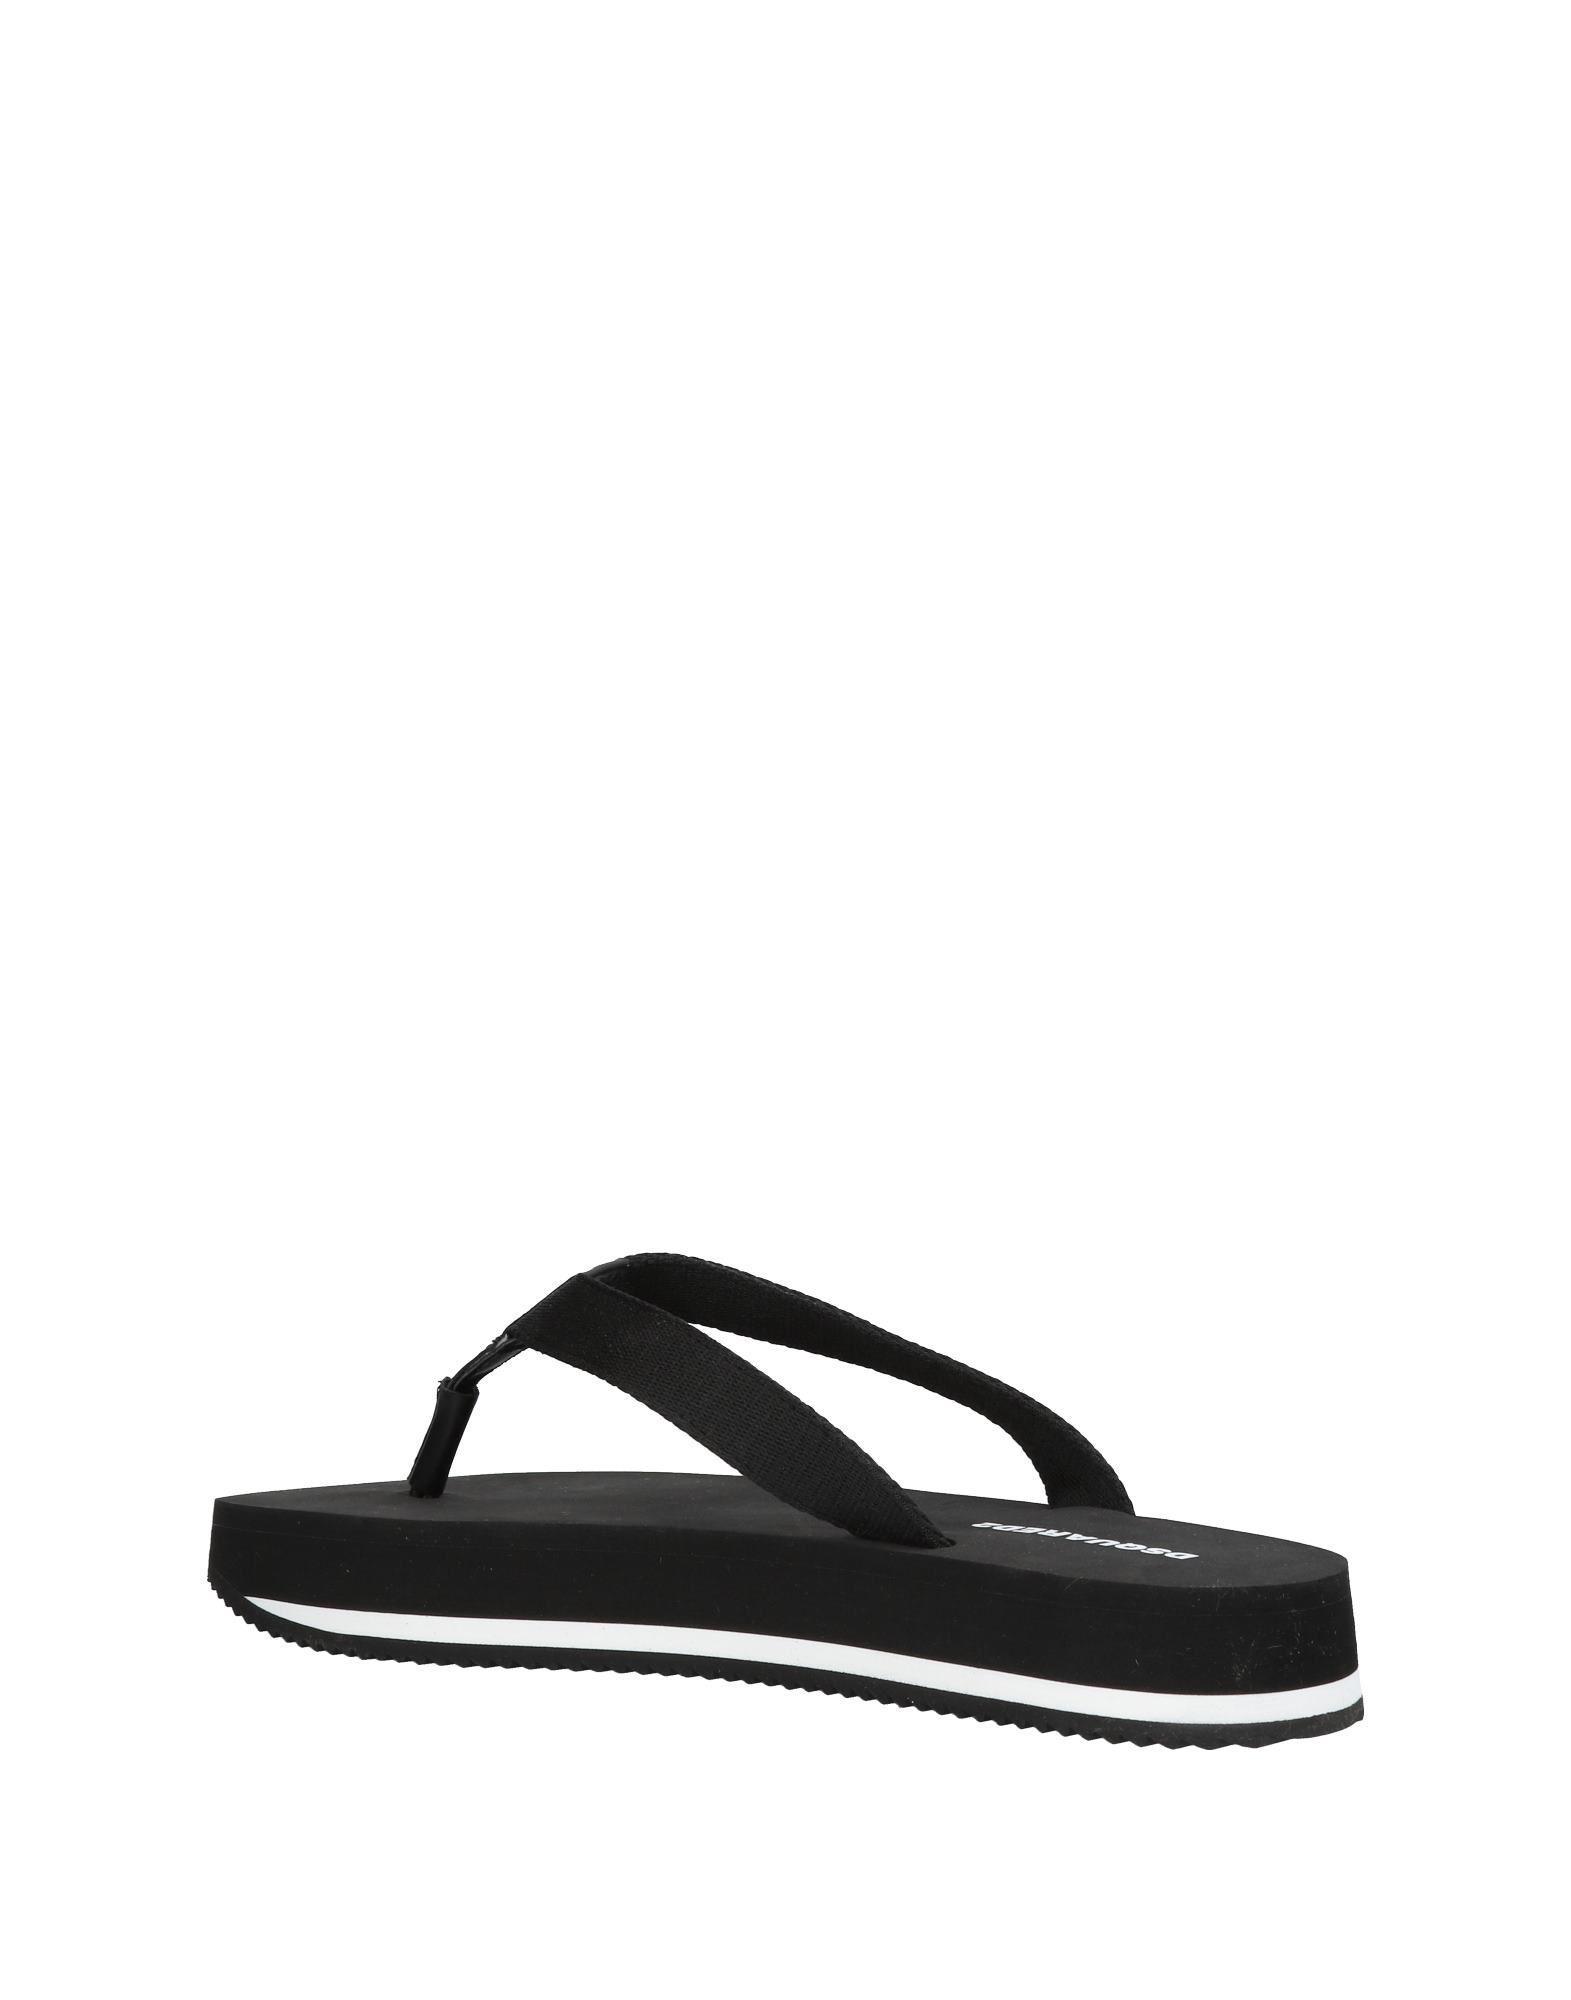 a0246f746 Lyst - DSquared² Toe Strap Sandal in Black for Men - Save 20%